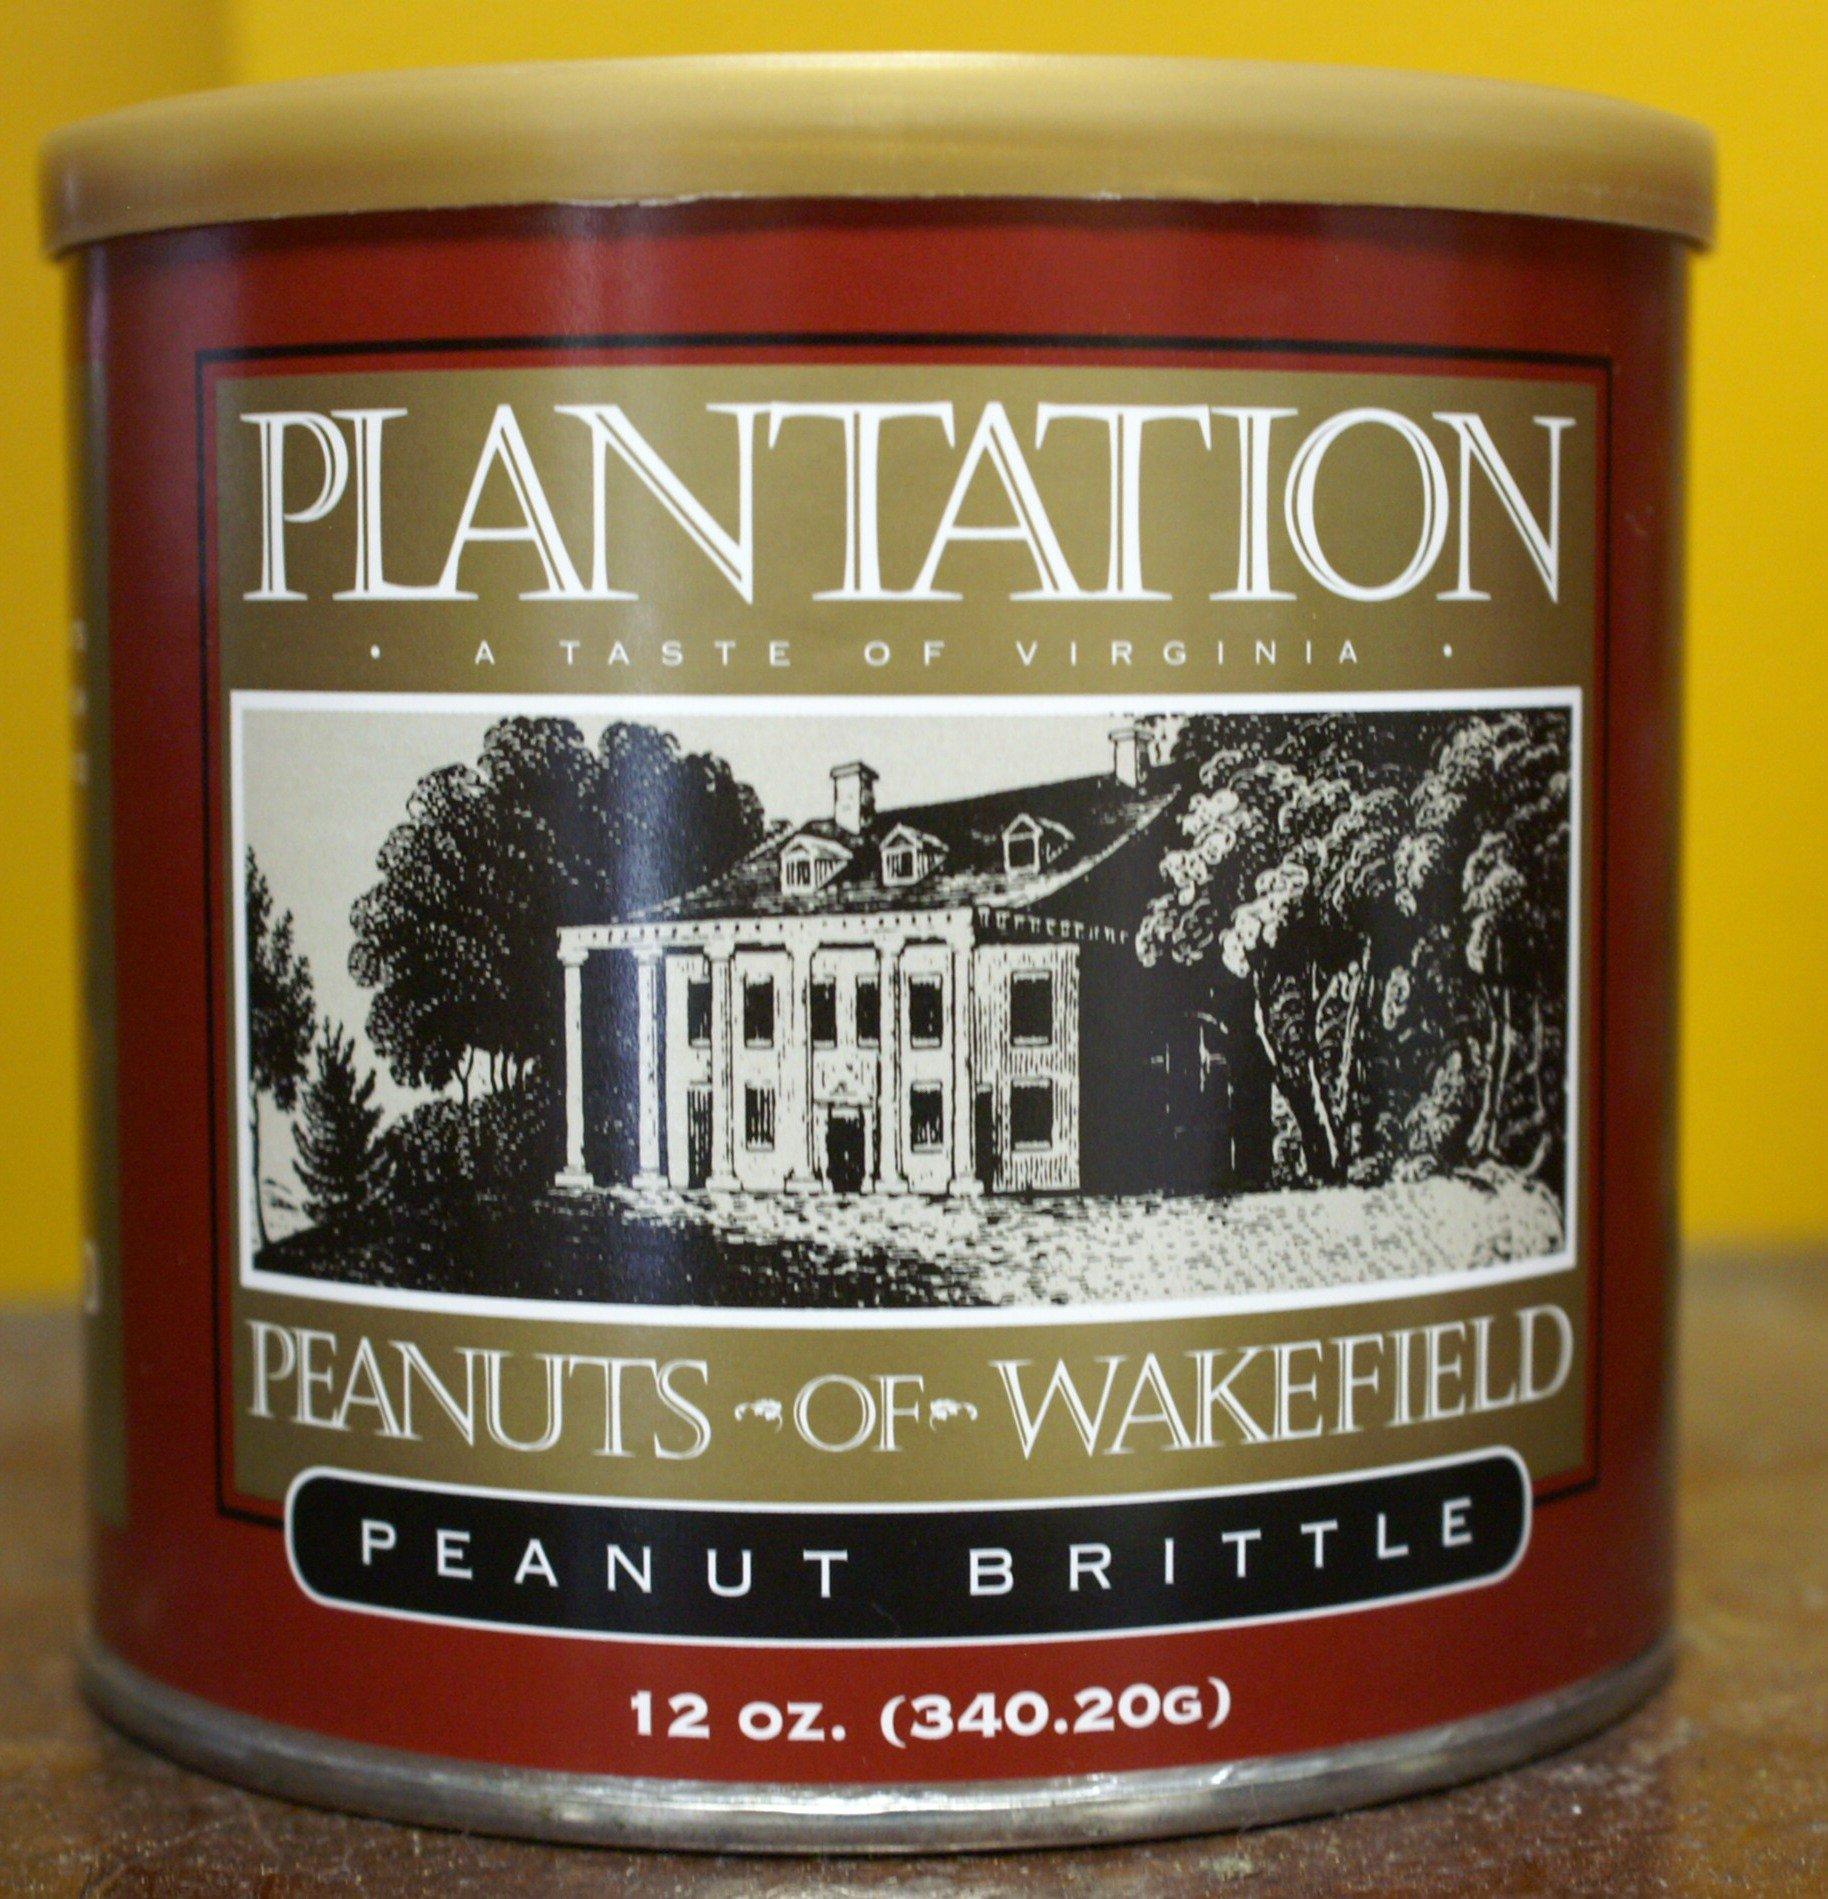 Plantation Peanut Brittle-2 PACK-All Natural Select Virginia Peanuts Traditional Virginia Recipe